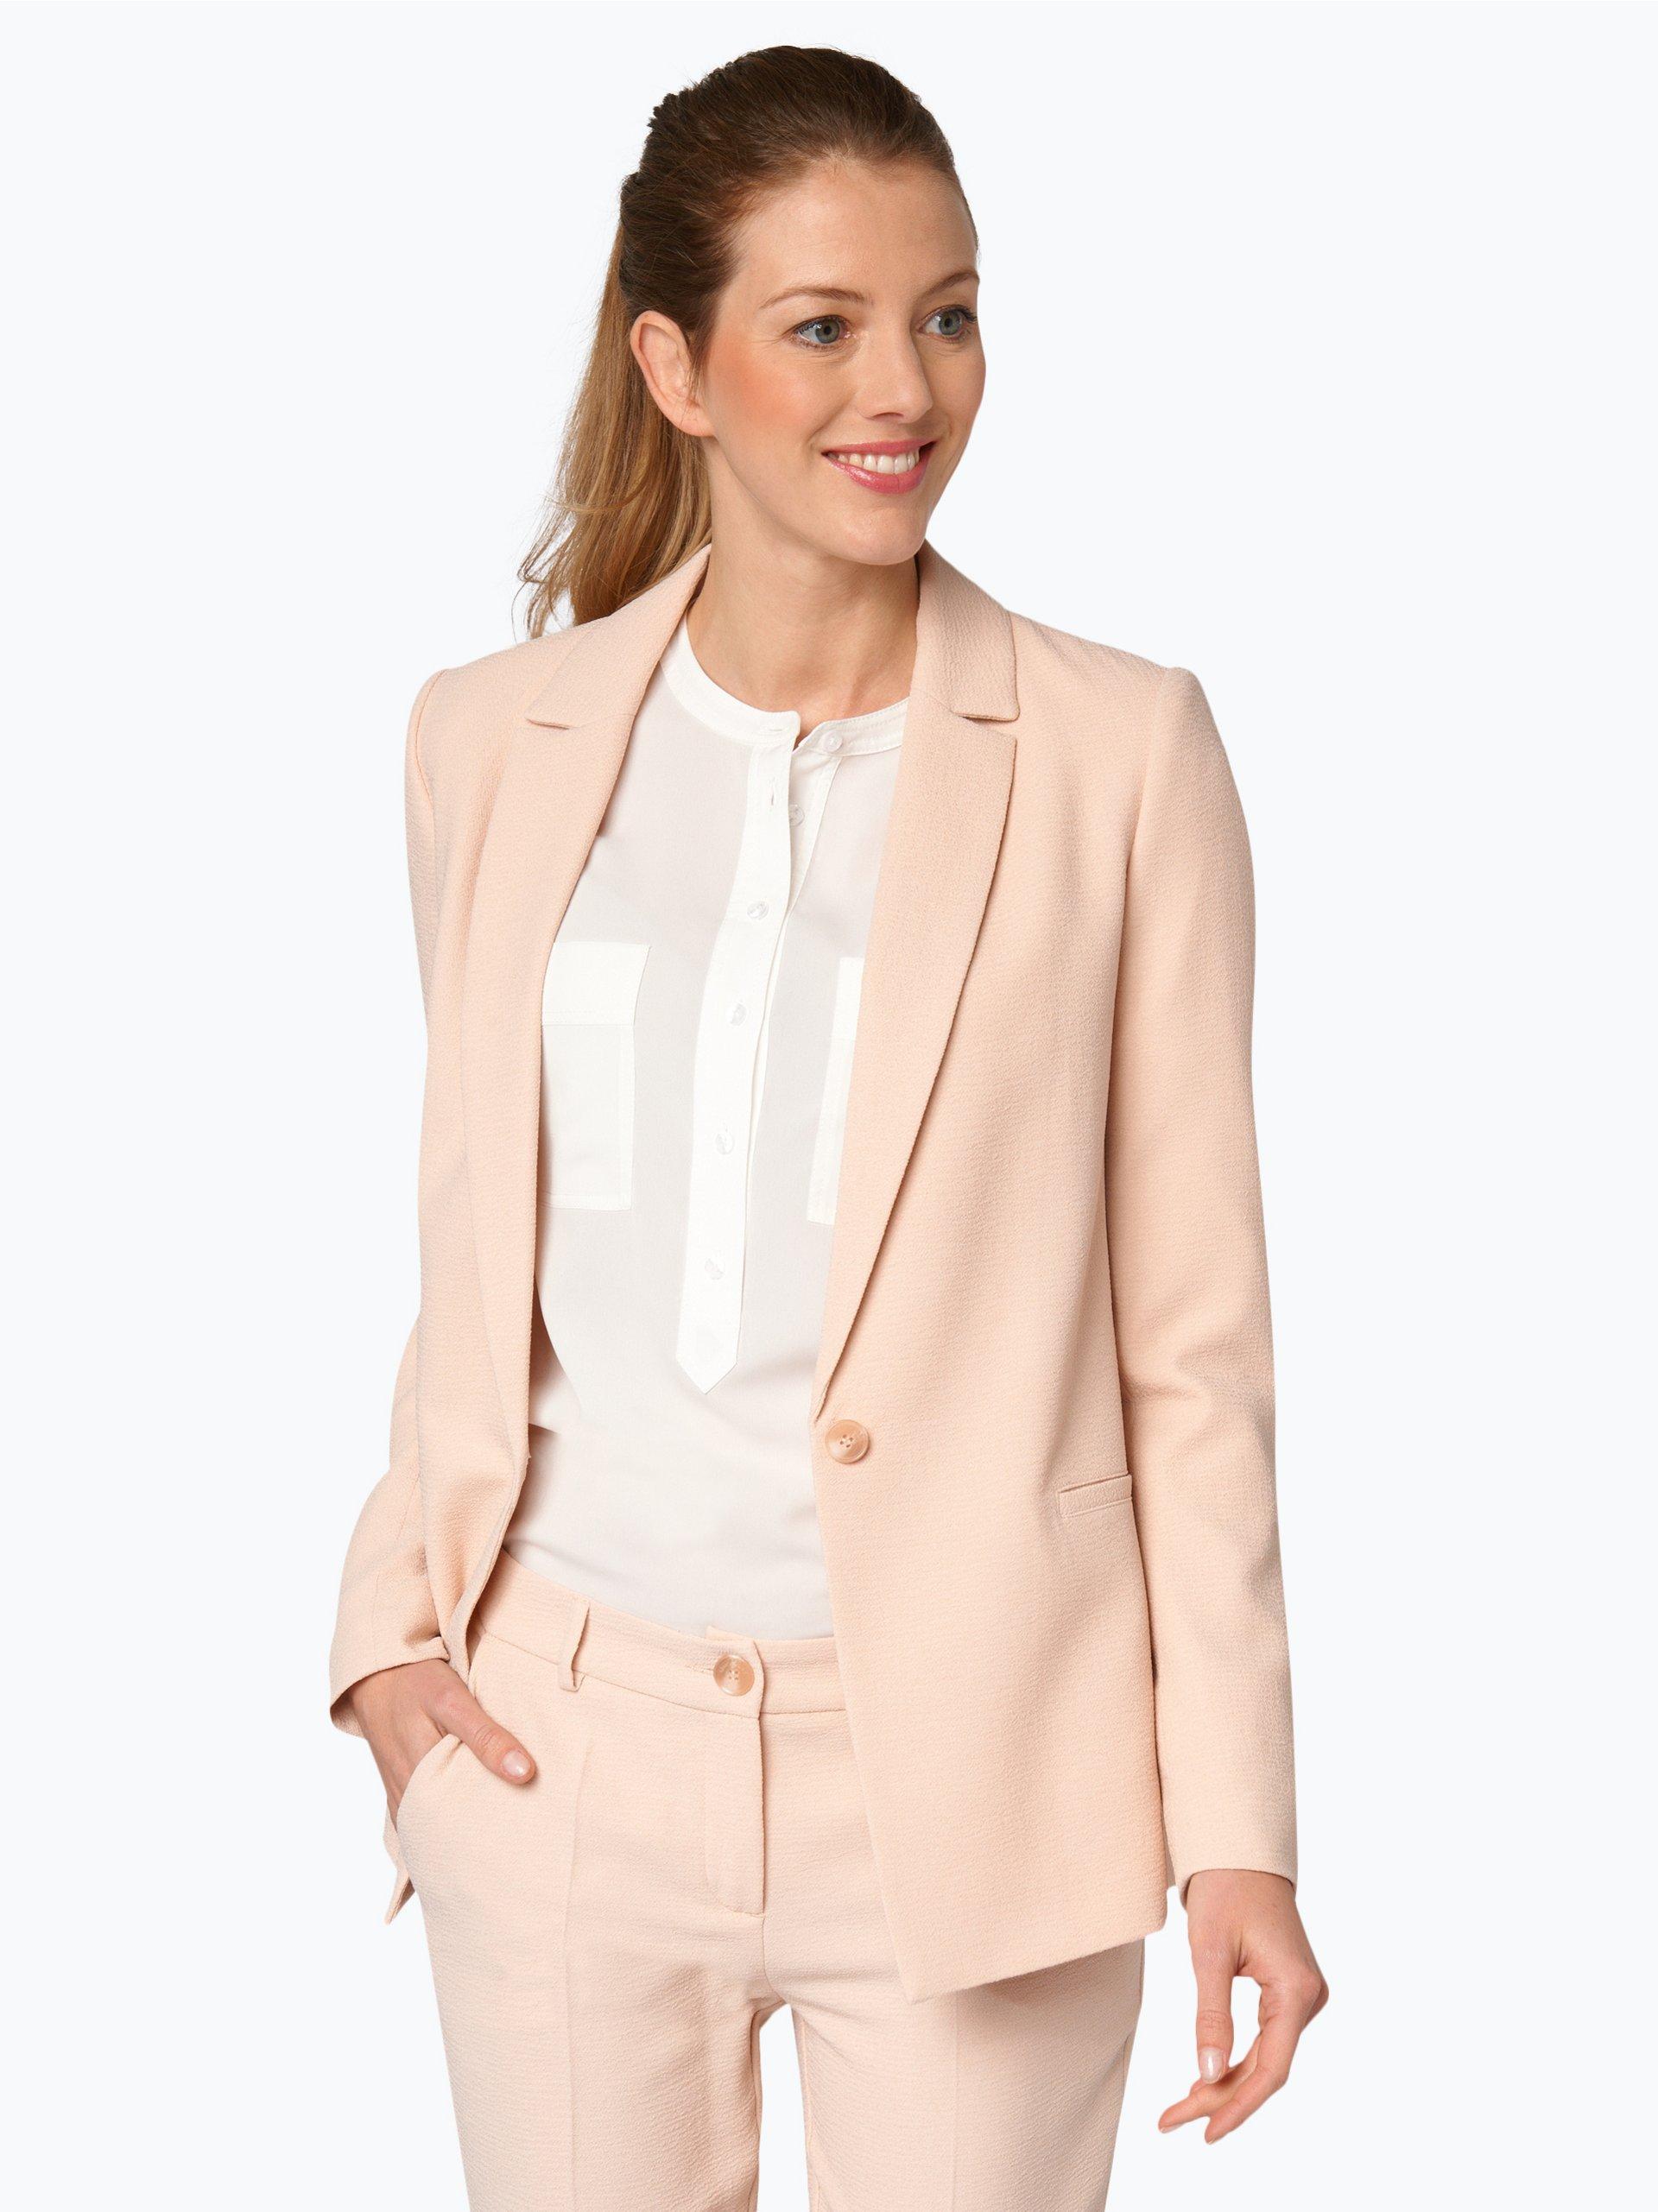 marie lund damen blazer rosa uni online kaufen vangraaf com. Black Bedroom Furniture Sets. Home Design Ideas